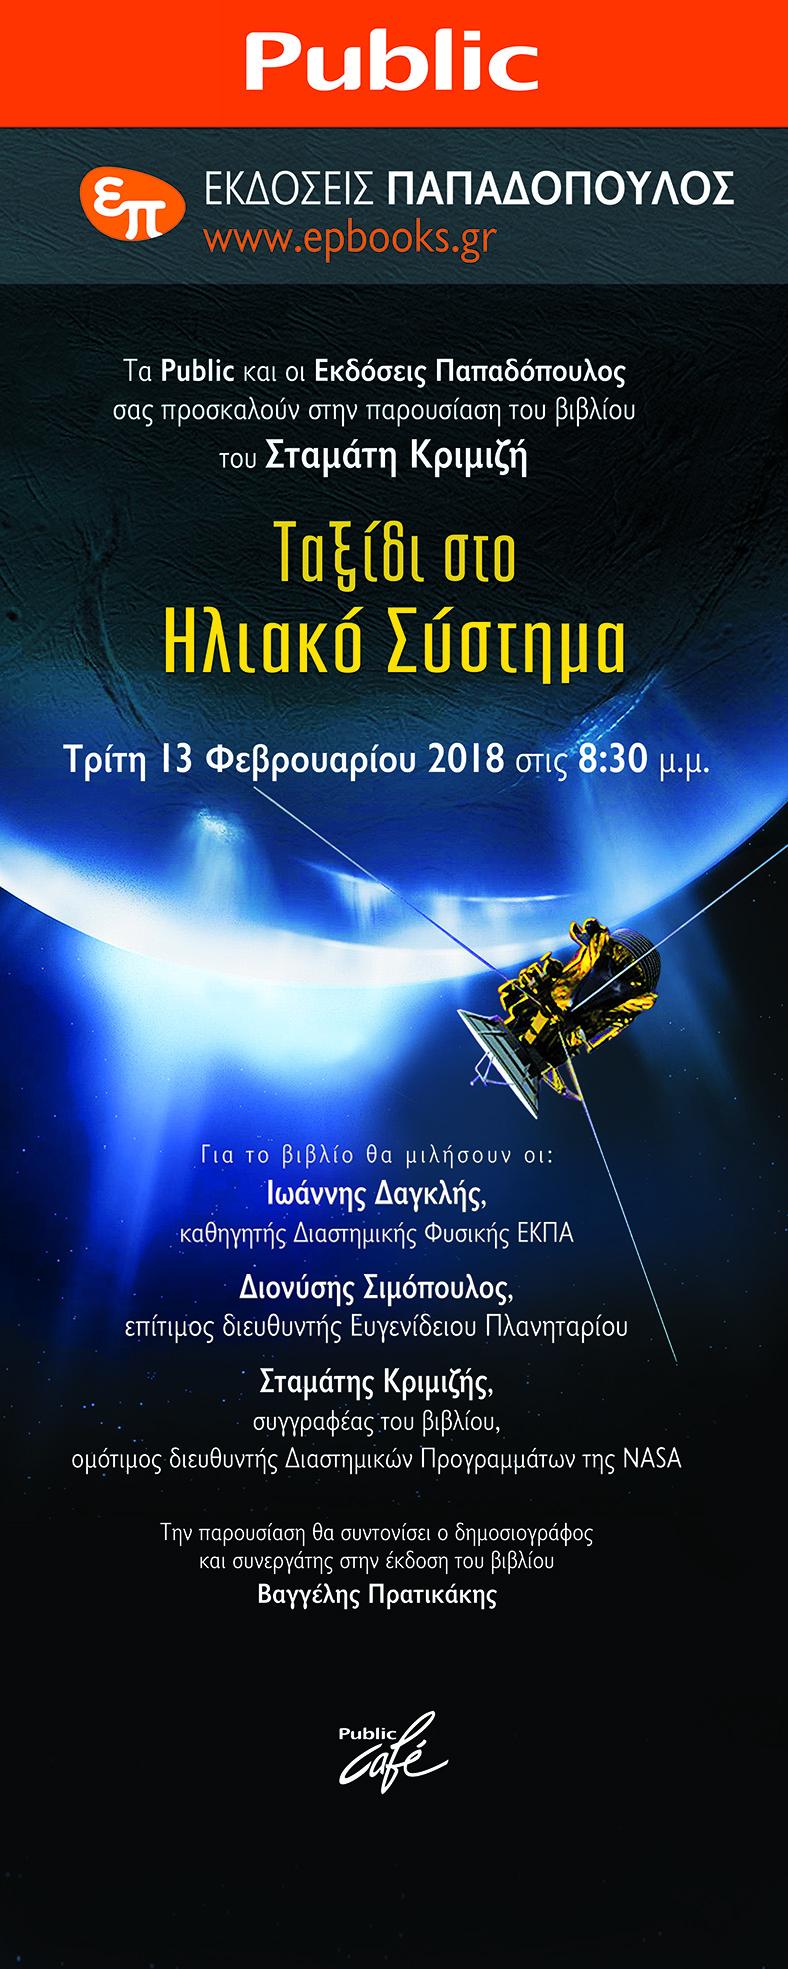 BANNER_TAXIDI STO HLIAKO SYSTHMA_Public_ 80x200